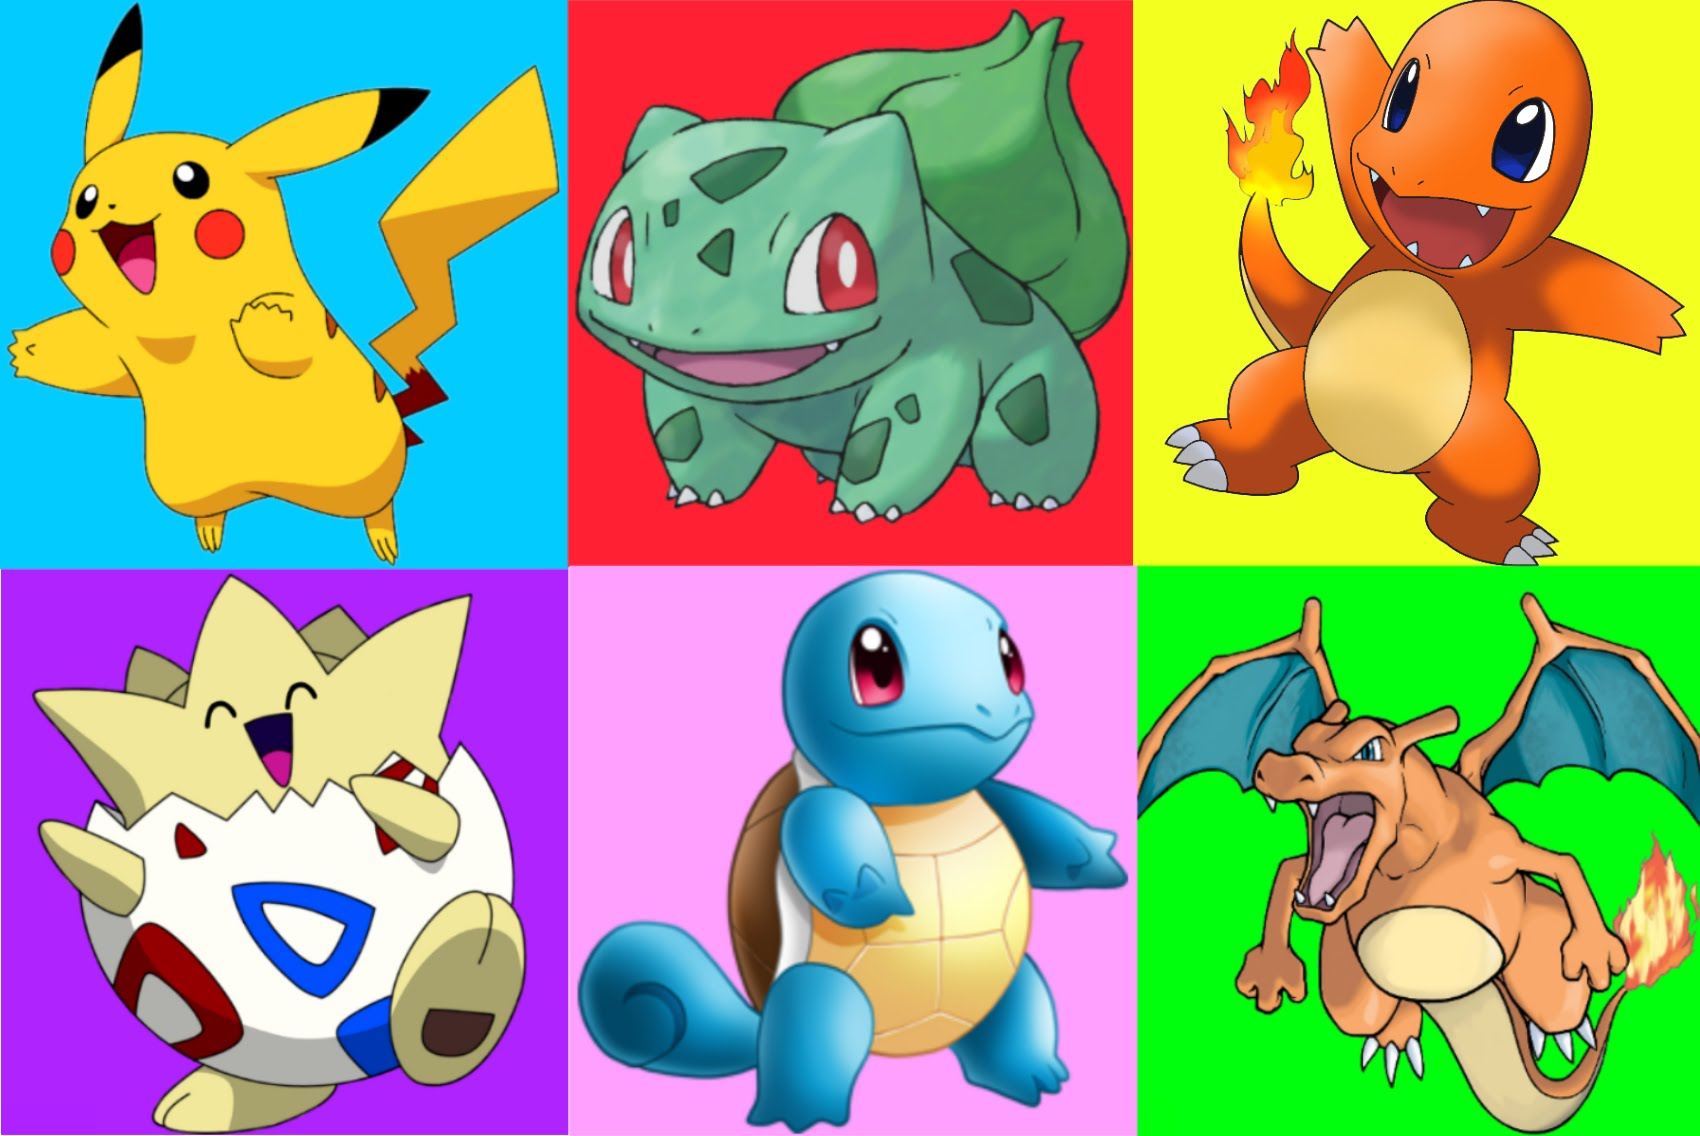 Pikachu clipart charmander Pikachu Pokemon Charmander Pokemon Colors